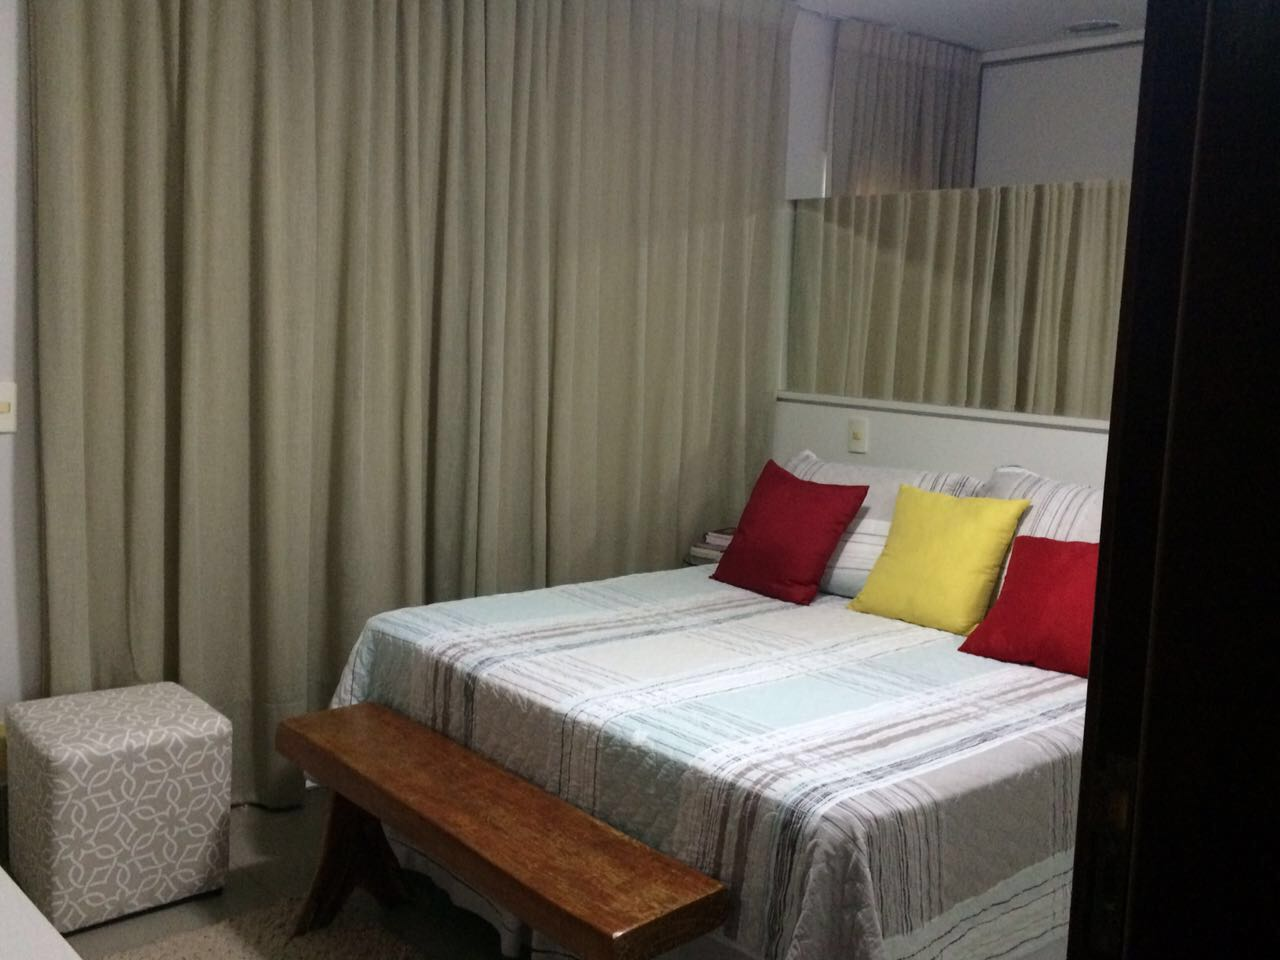 Casa Cond. Fechado  com 3 quartos sendo 1 Suíte no Jardim Imperial, Cuiabá  - MT